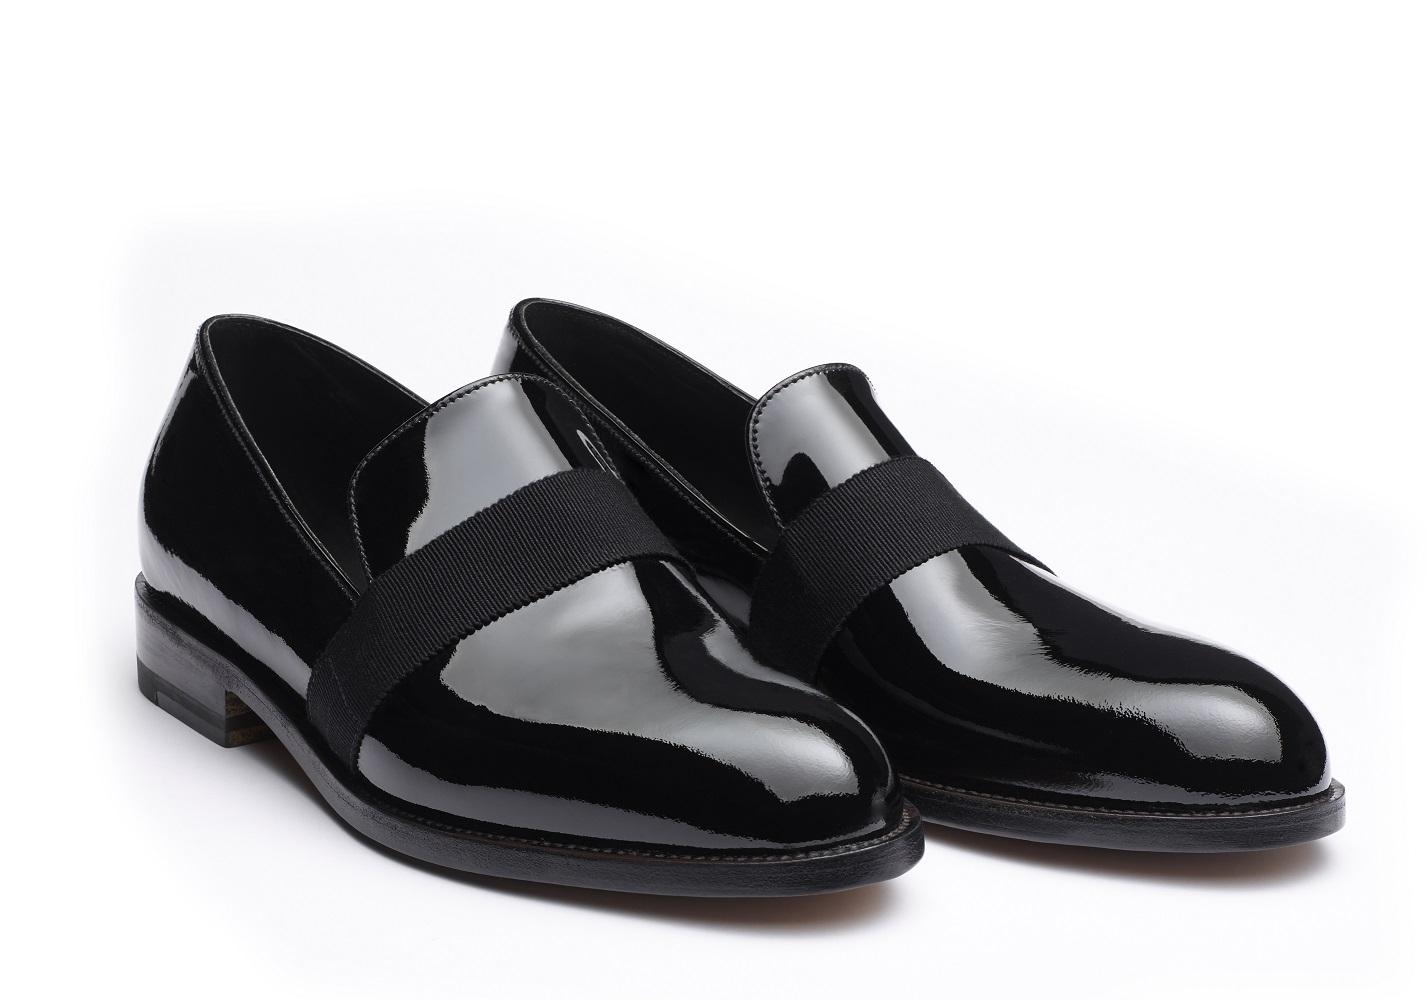 chaussures weston pour femme. Black Bedroom Furniture Sets. Home Design Ideas